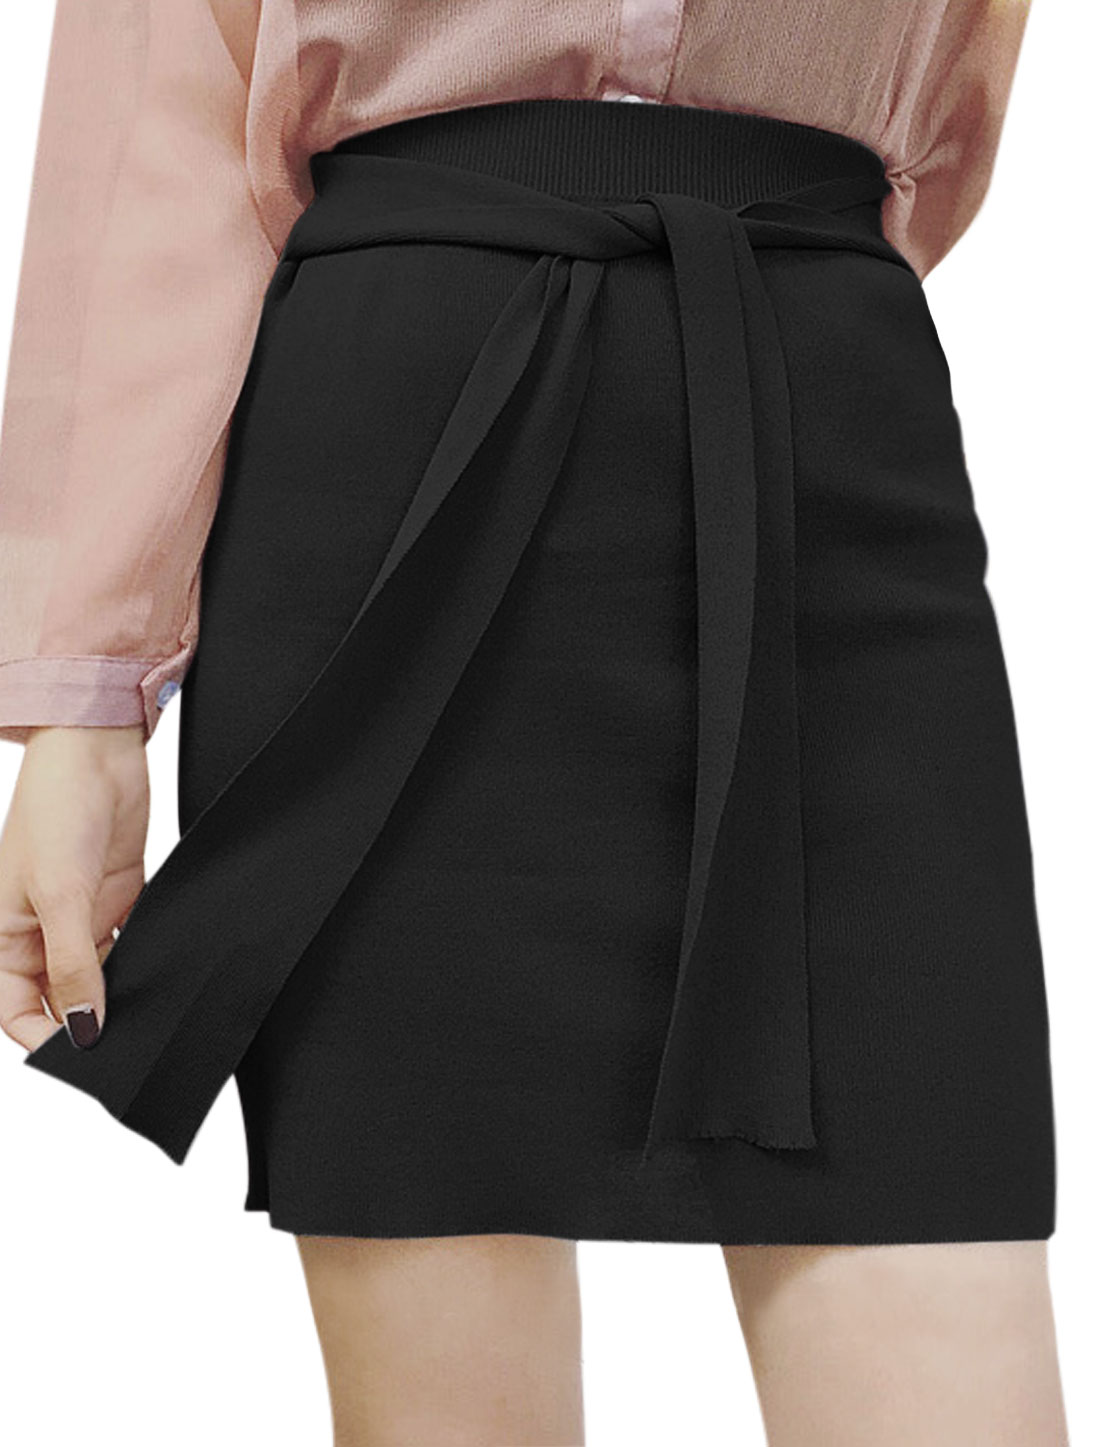 Women Self Tie Front High Waist Knitted Straight Skirt Black XS